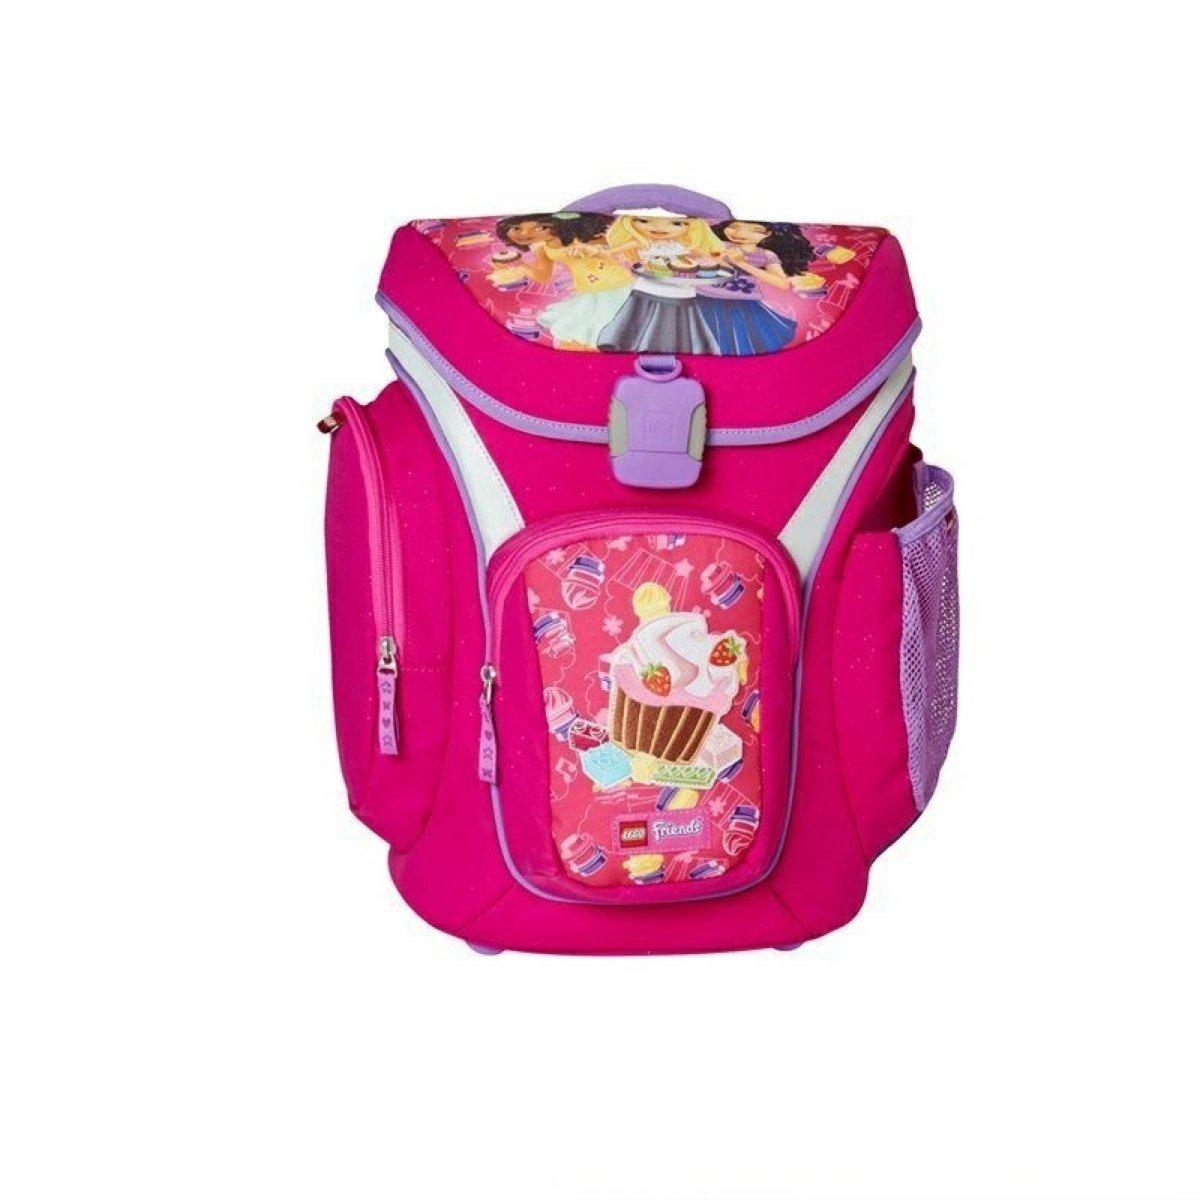 Panini Franco - Set de útiles escolares  rosa ROSA